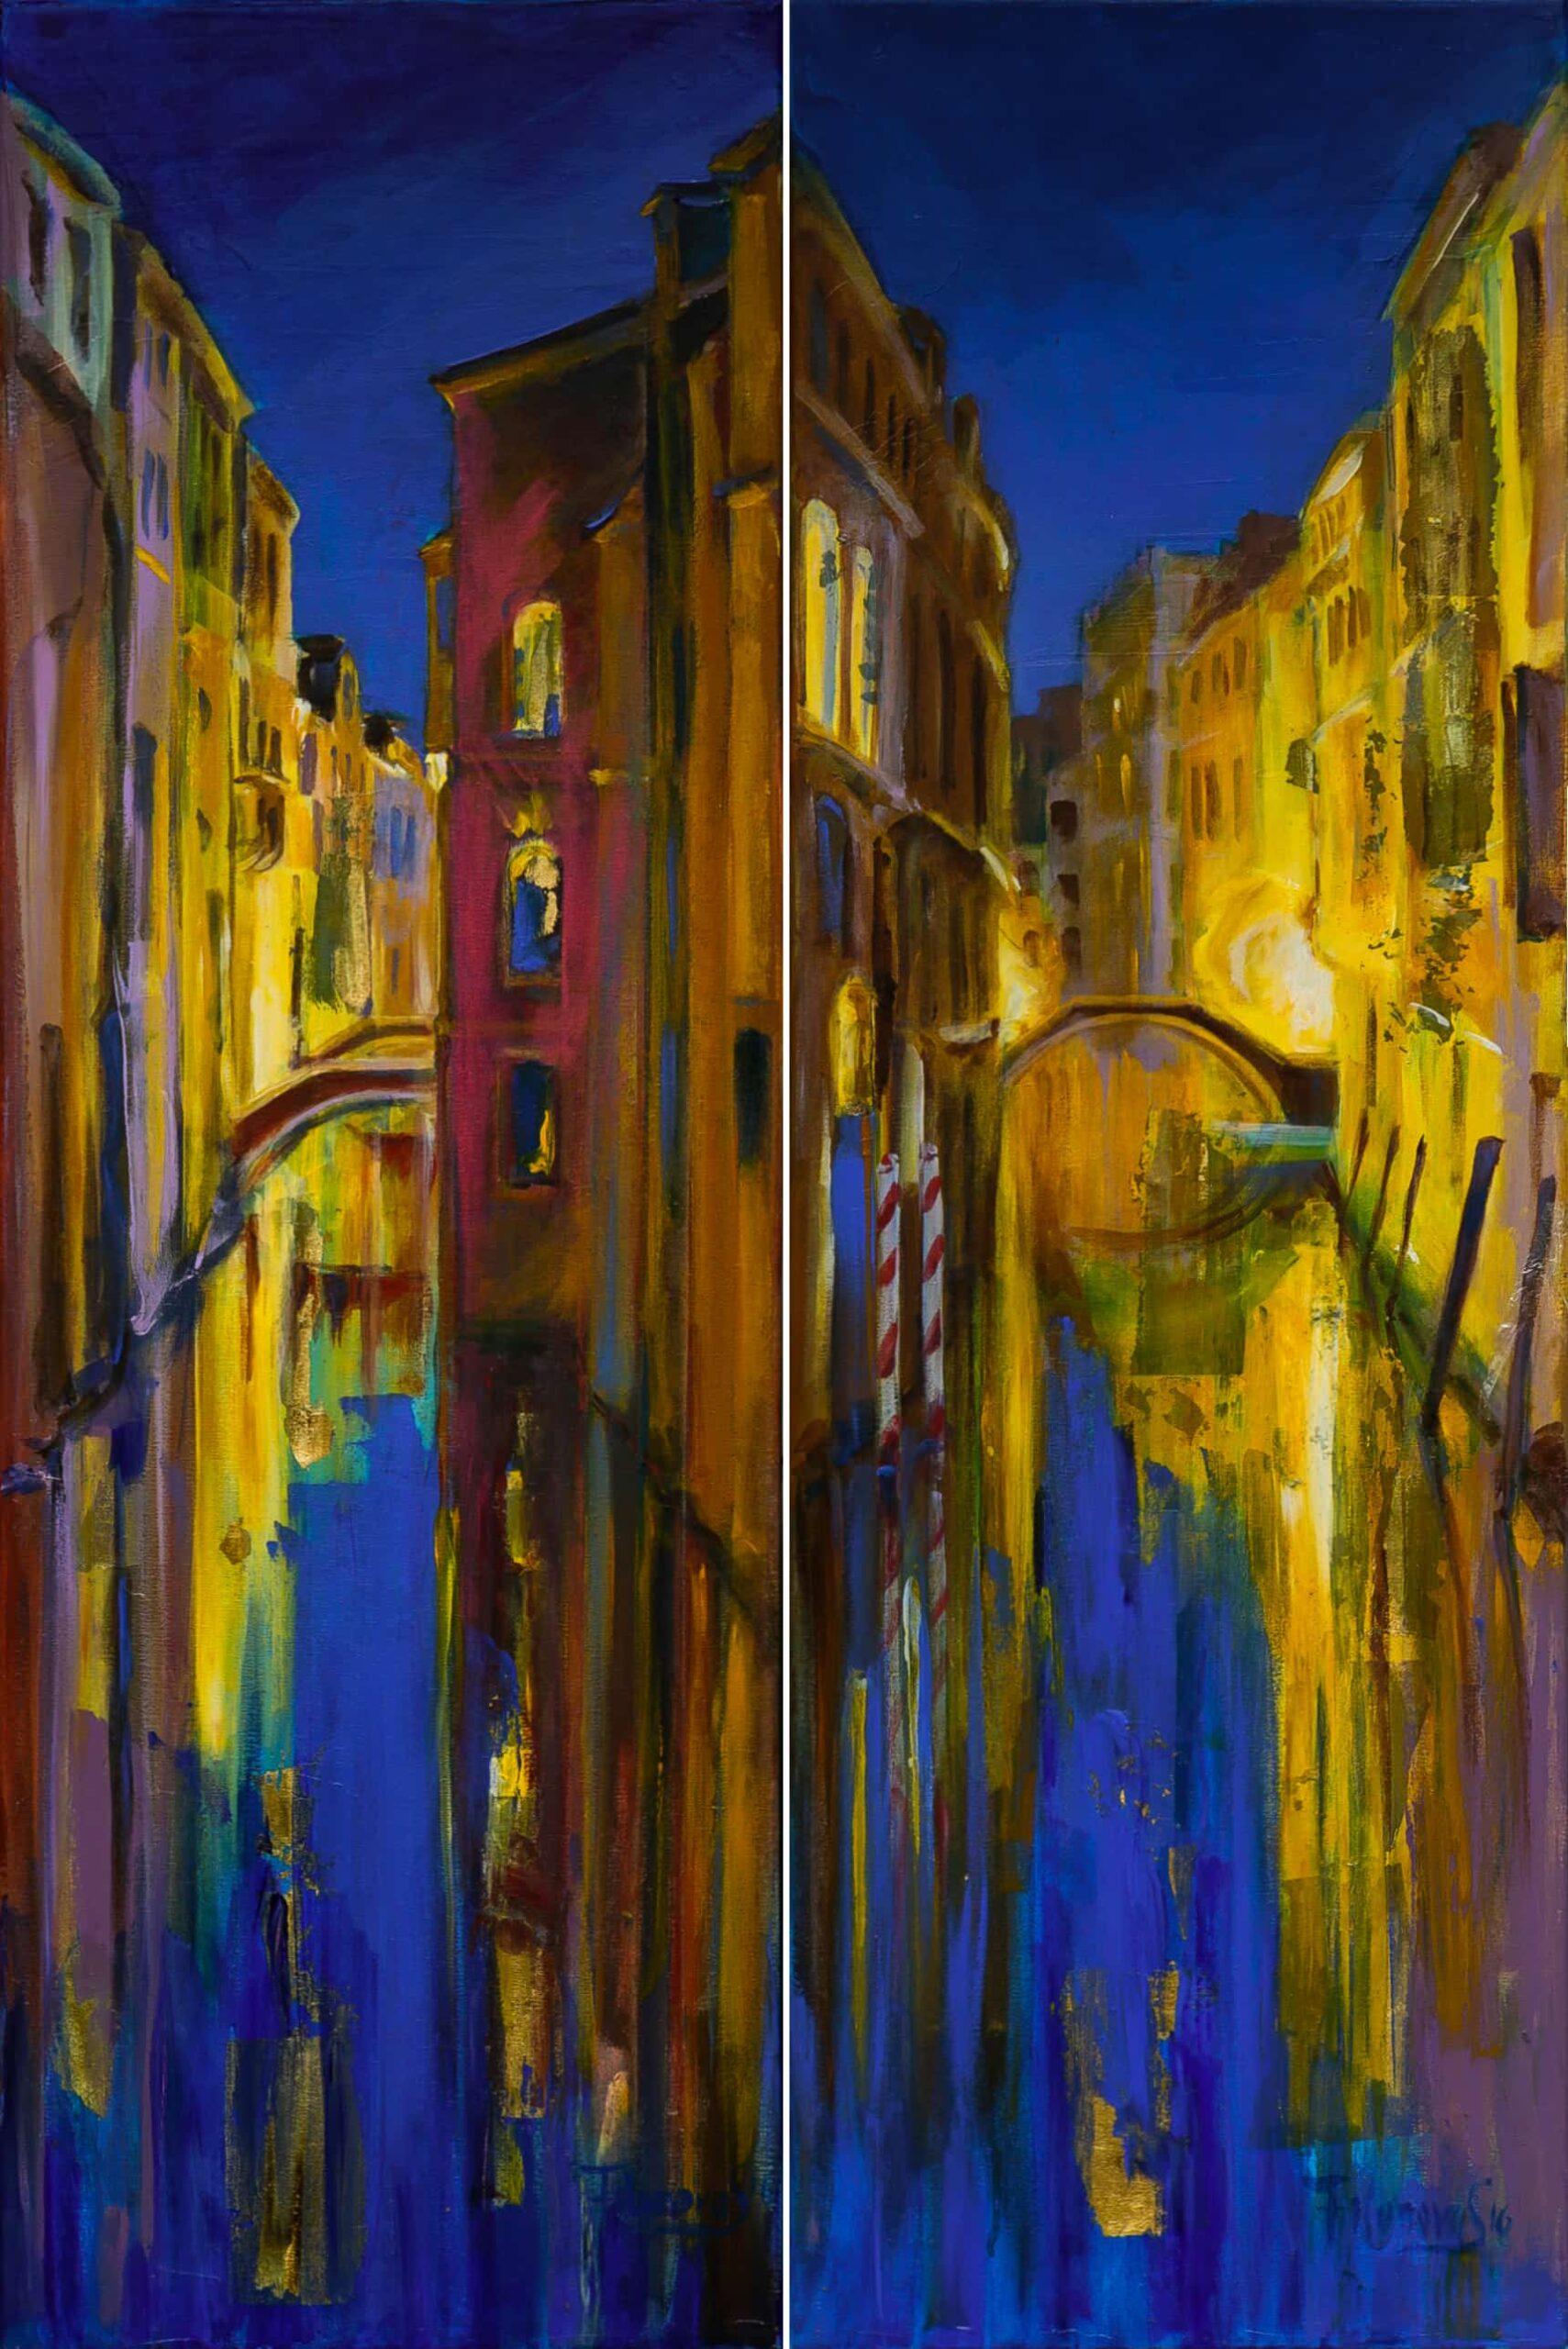 Canals of Venice Night_Diptich_Acrylic_Leinwand_120_80cm_2016 Svetlana Catif-Filonova